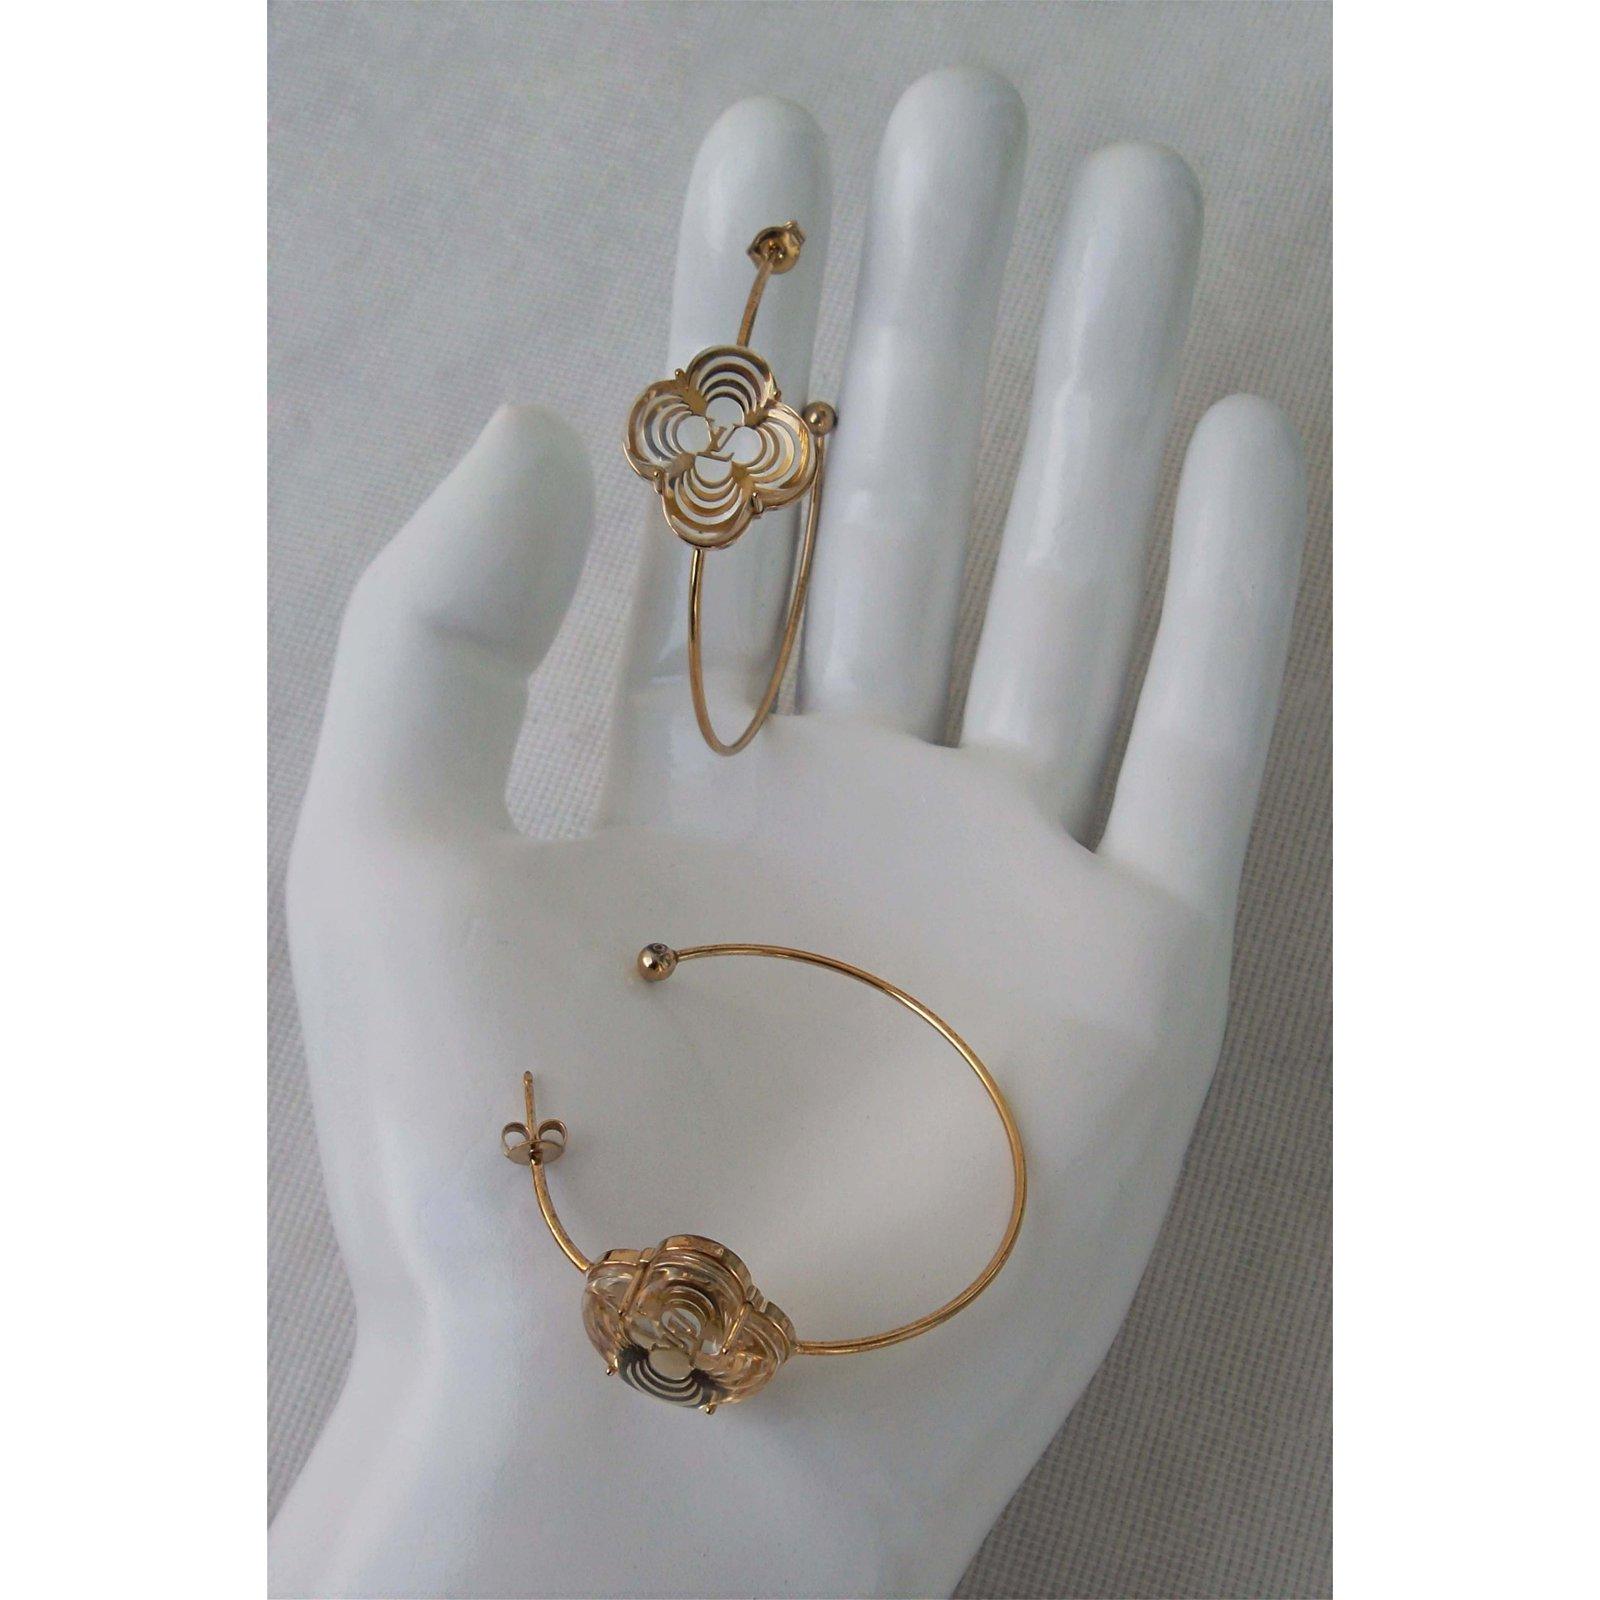 88c11e151 Louis Vuitton Earrings Earrings Gold-plated Golden ref.41387 - Joli Closet